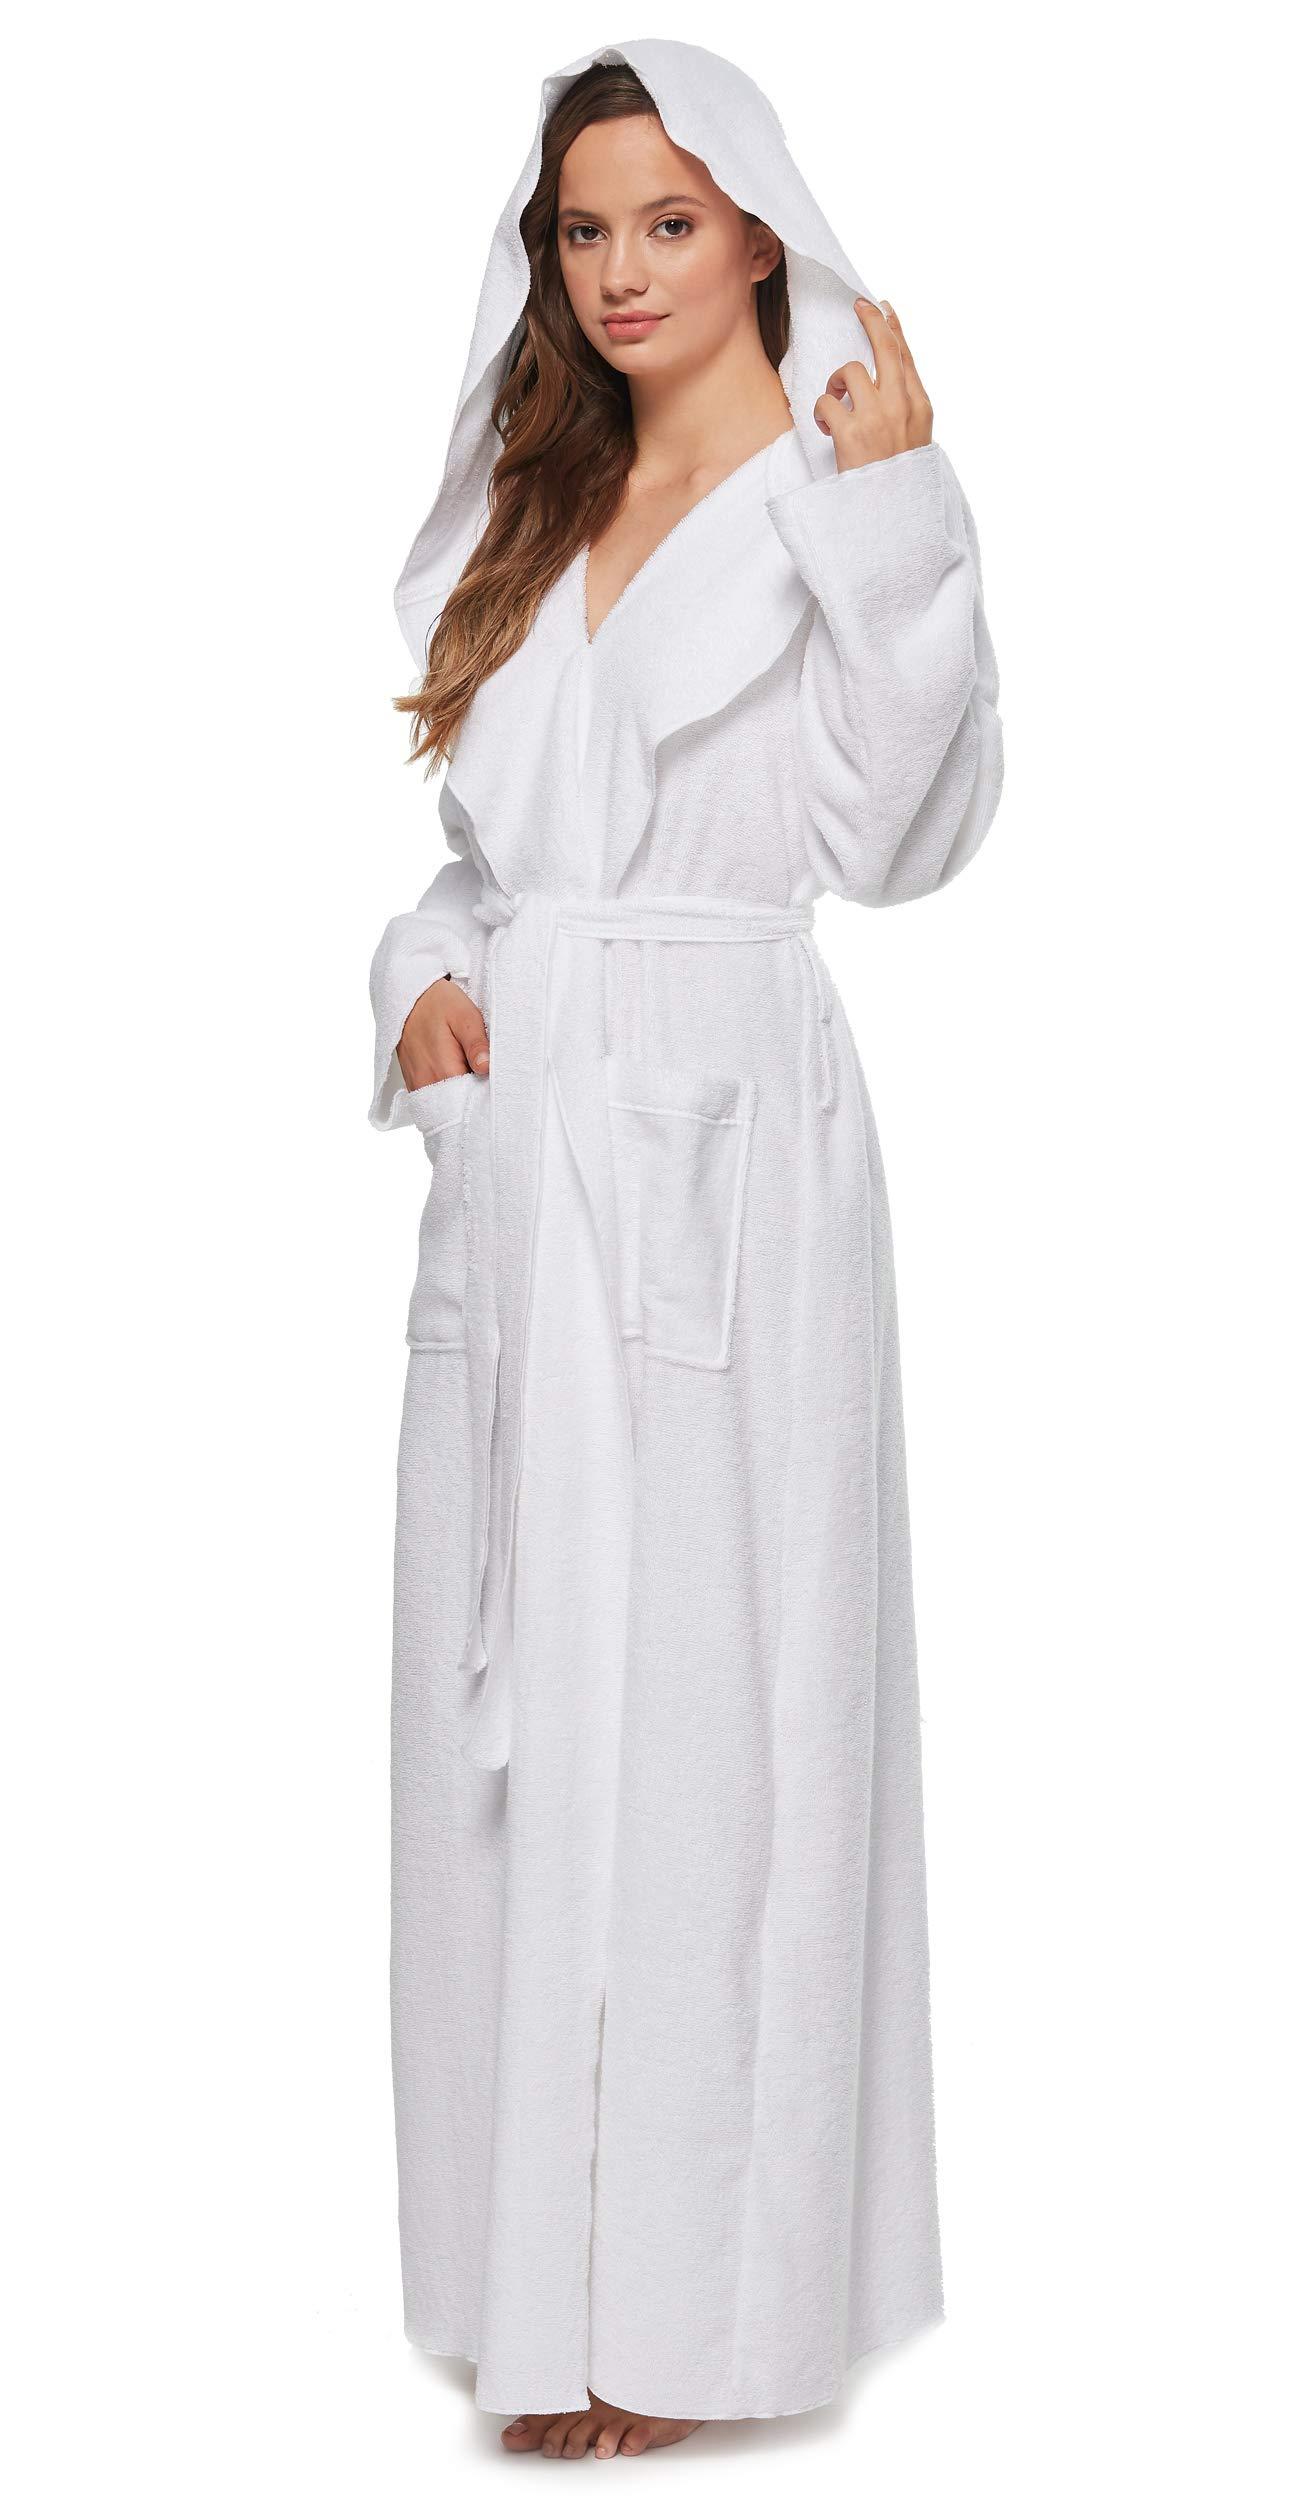 Arus Women's Princess Robe Ankle Long Hooded Silky Light Turkish Cotton Bathrobe